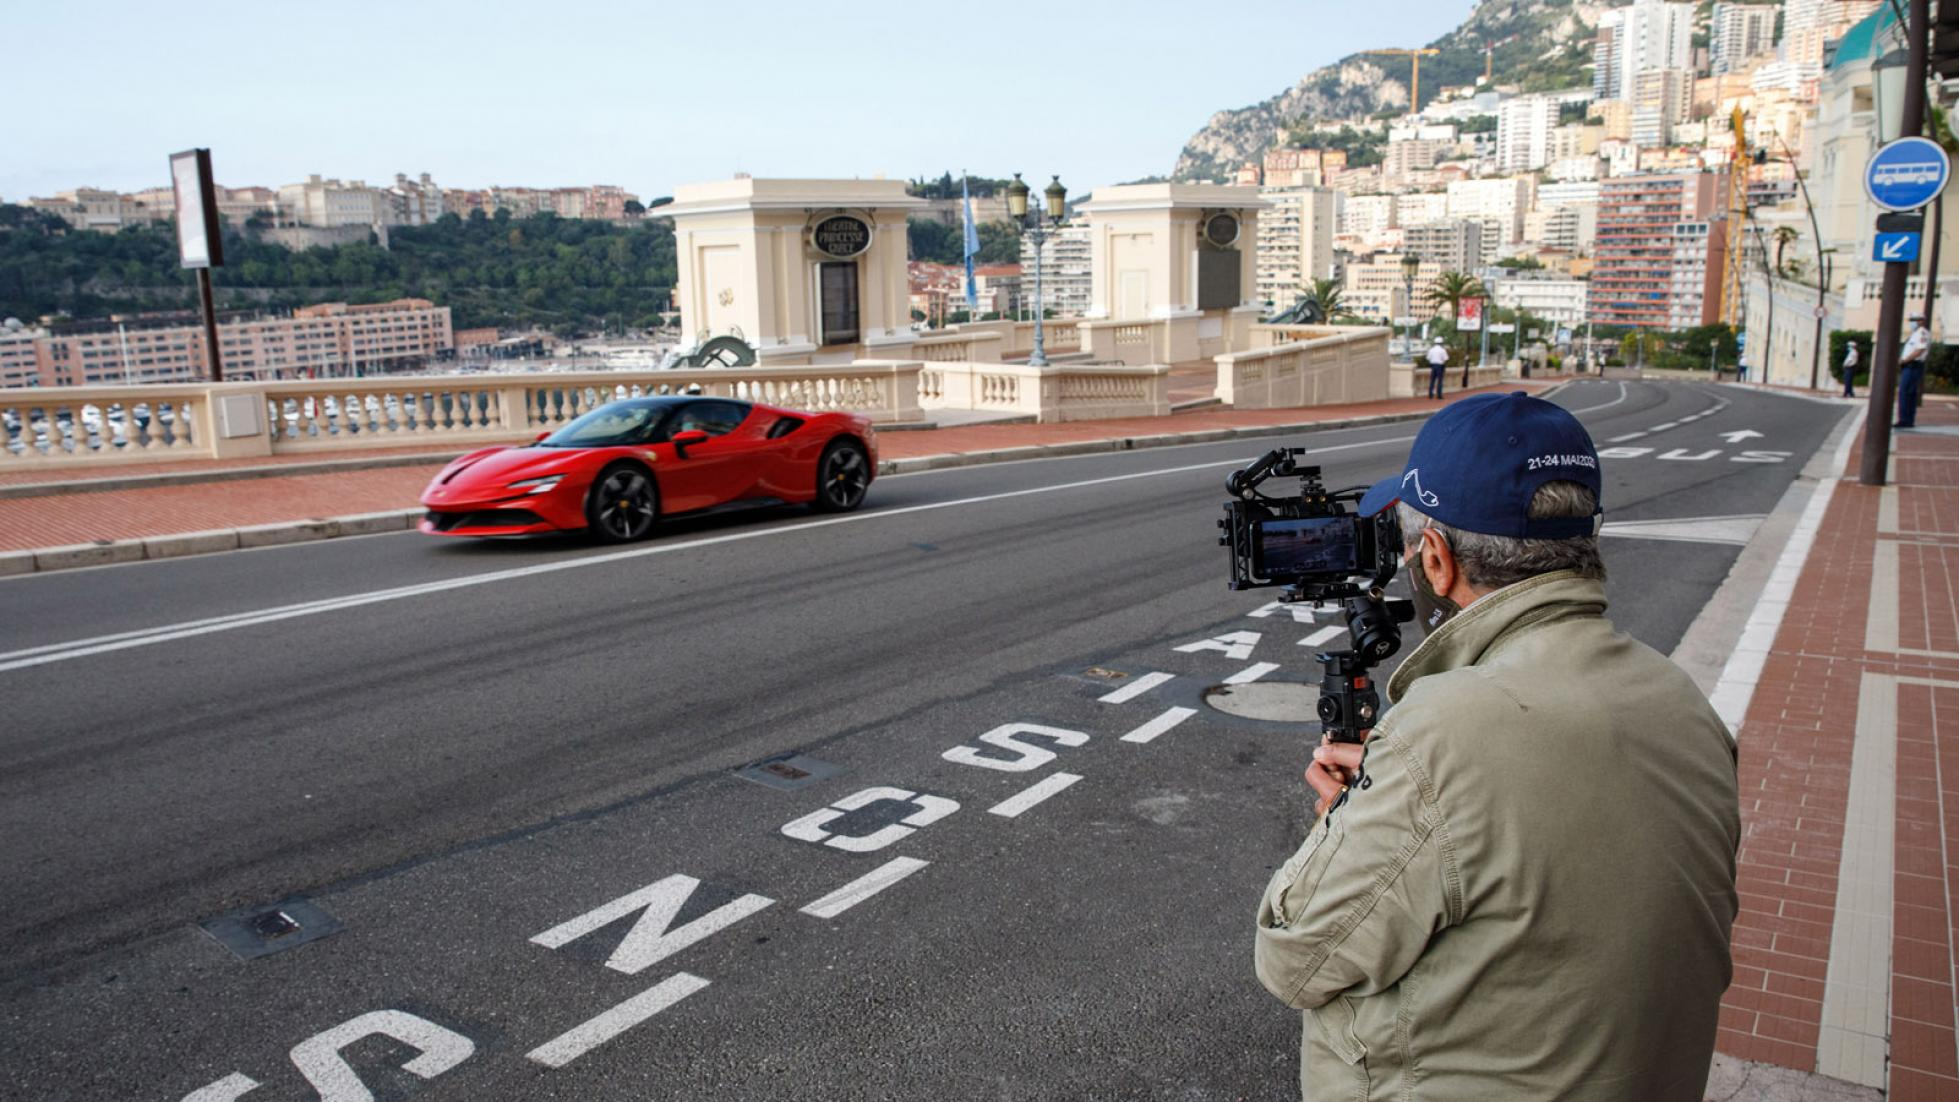 Charles-Leclerc-Ferrari-SF90-Stradale-Monaco-10